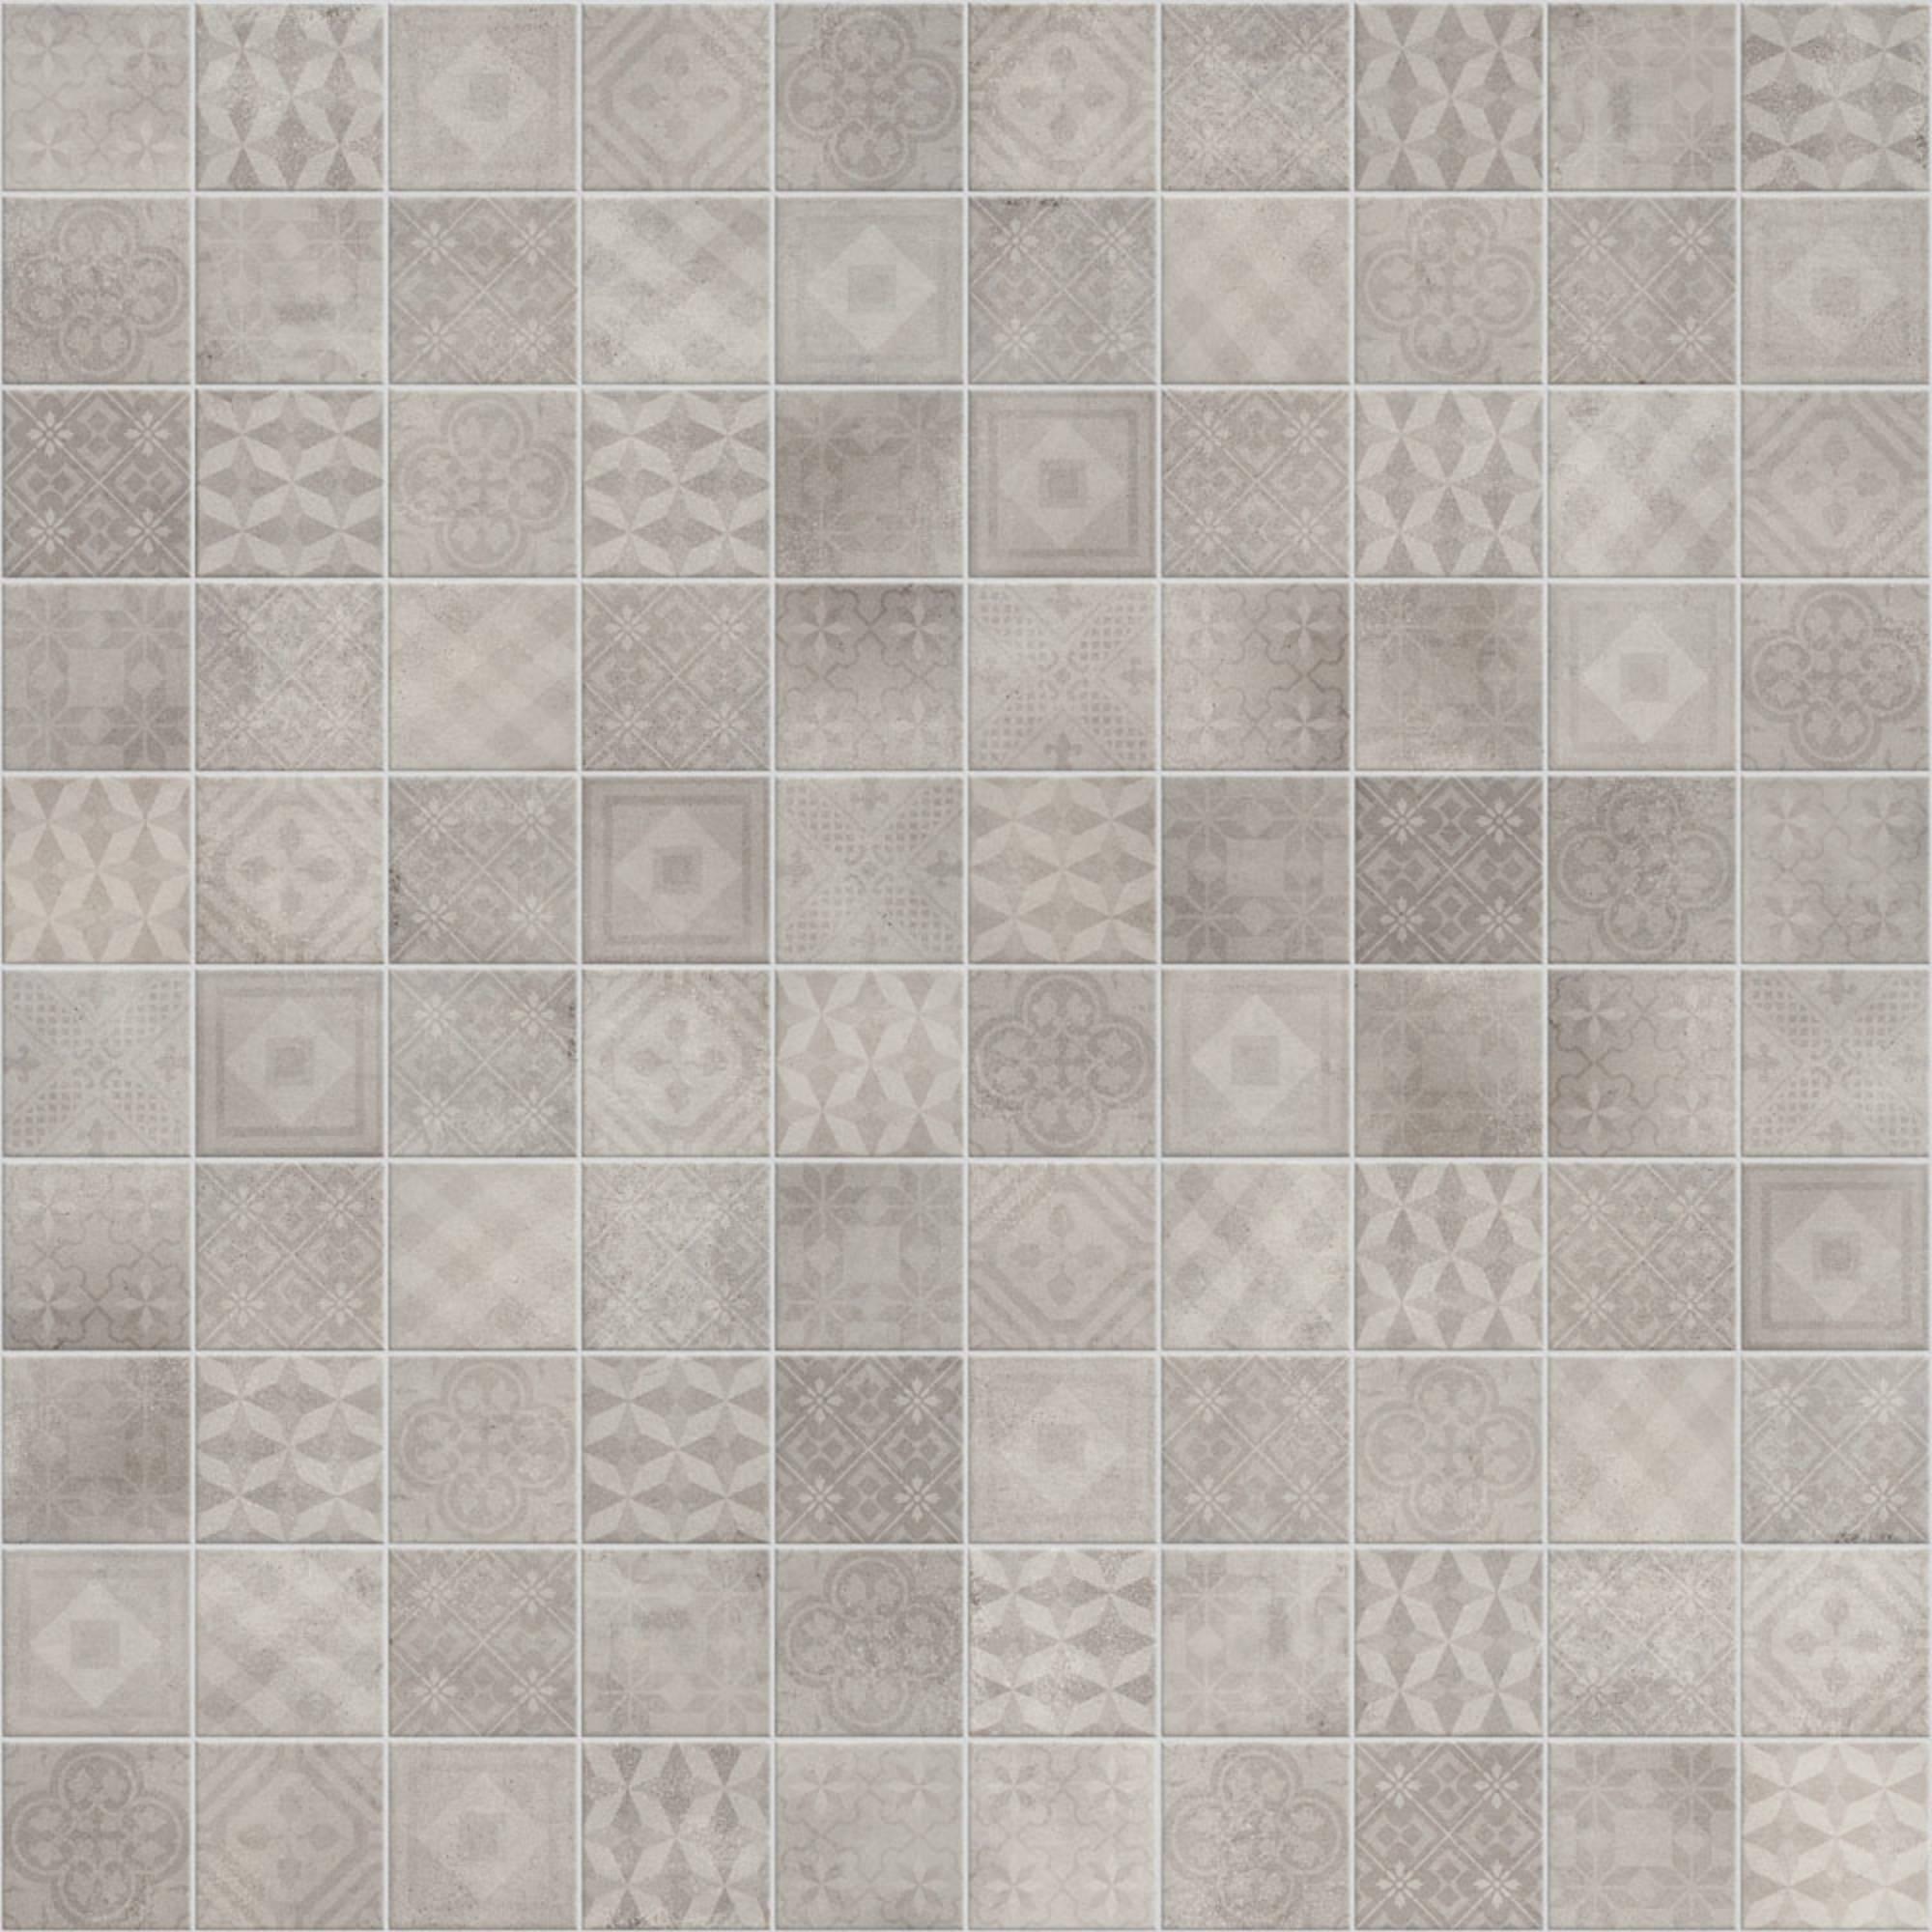 Vloertegel Terratinta Betonsquare 10x10 cm white grey decor mix 0,88 M2